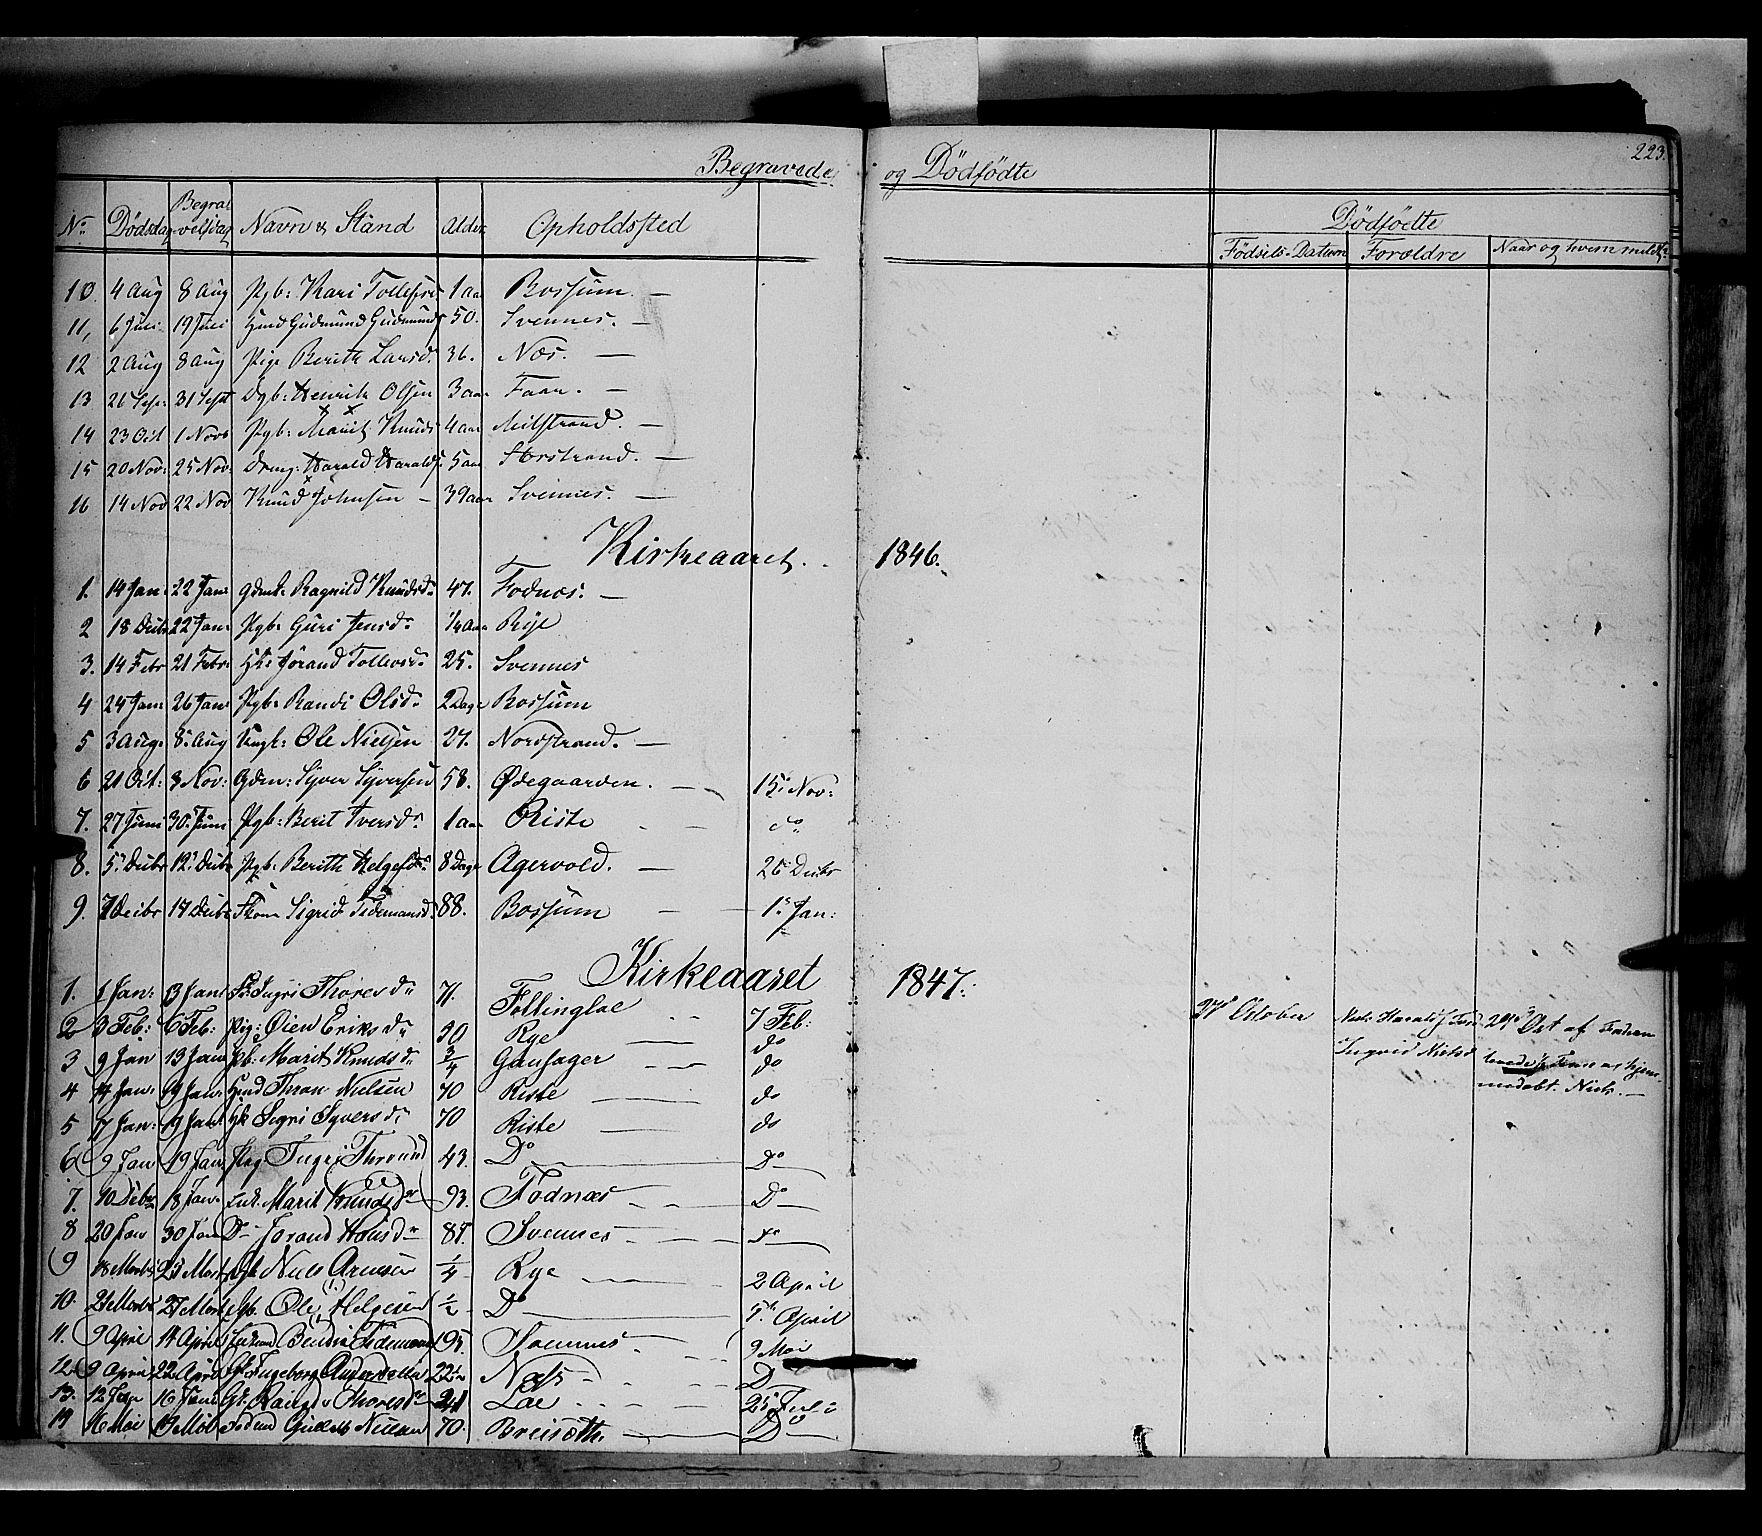 SAH, Nord-Aurdal prestekontor, Ministerialbok nr. 5, 1842-1863, s. 223